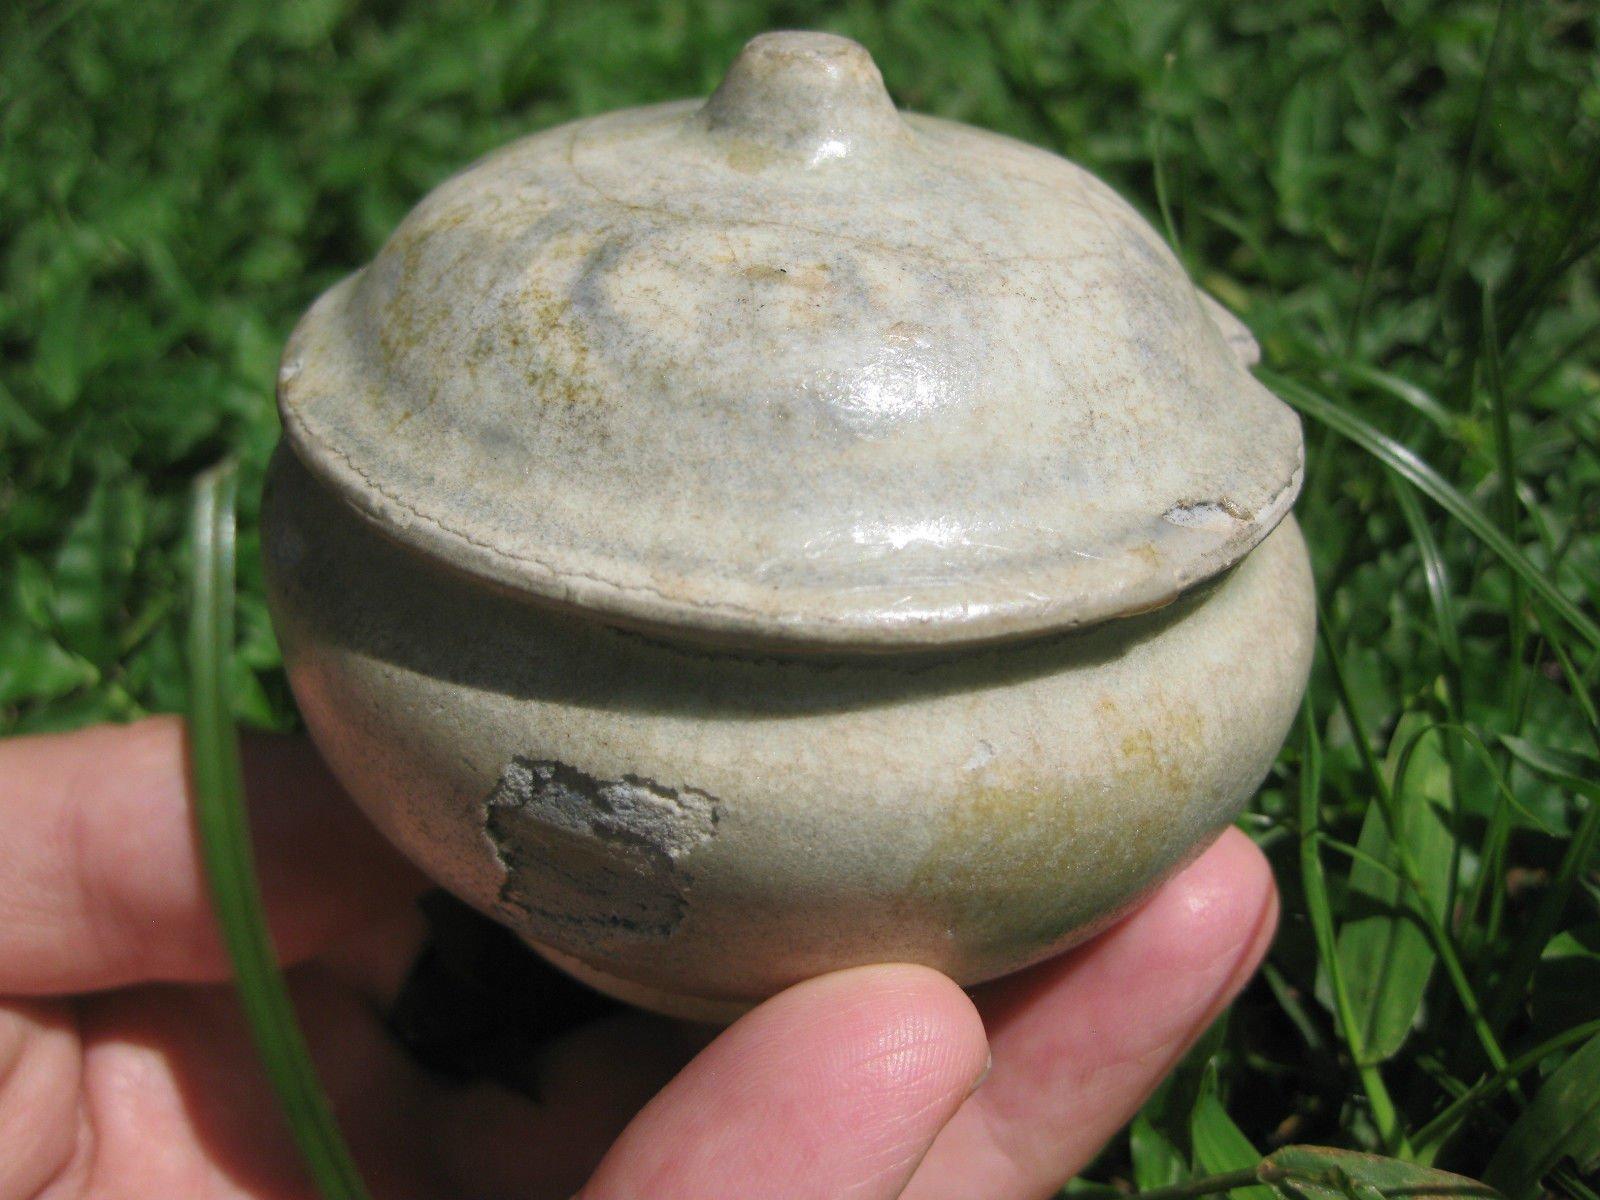 Thai glazed small lidded jar pottery, Savankhalok, Thailaland, 1200-1400AD